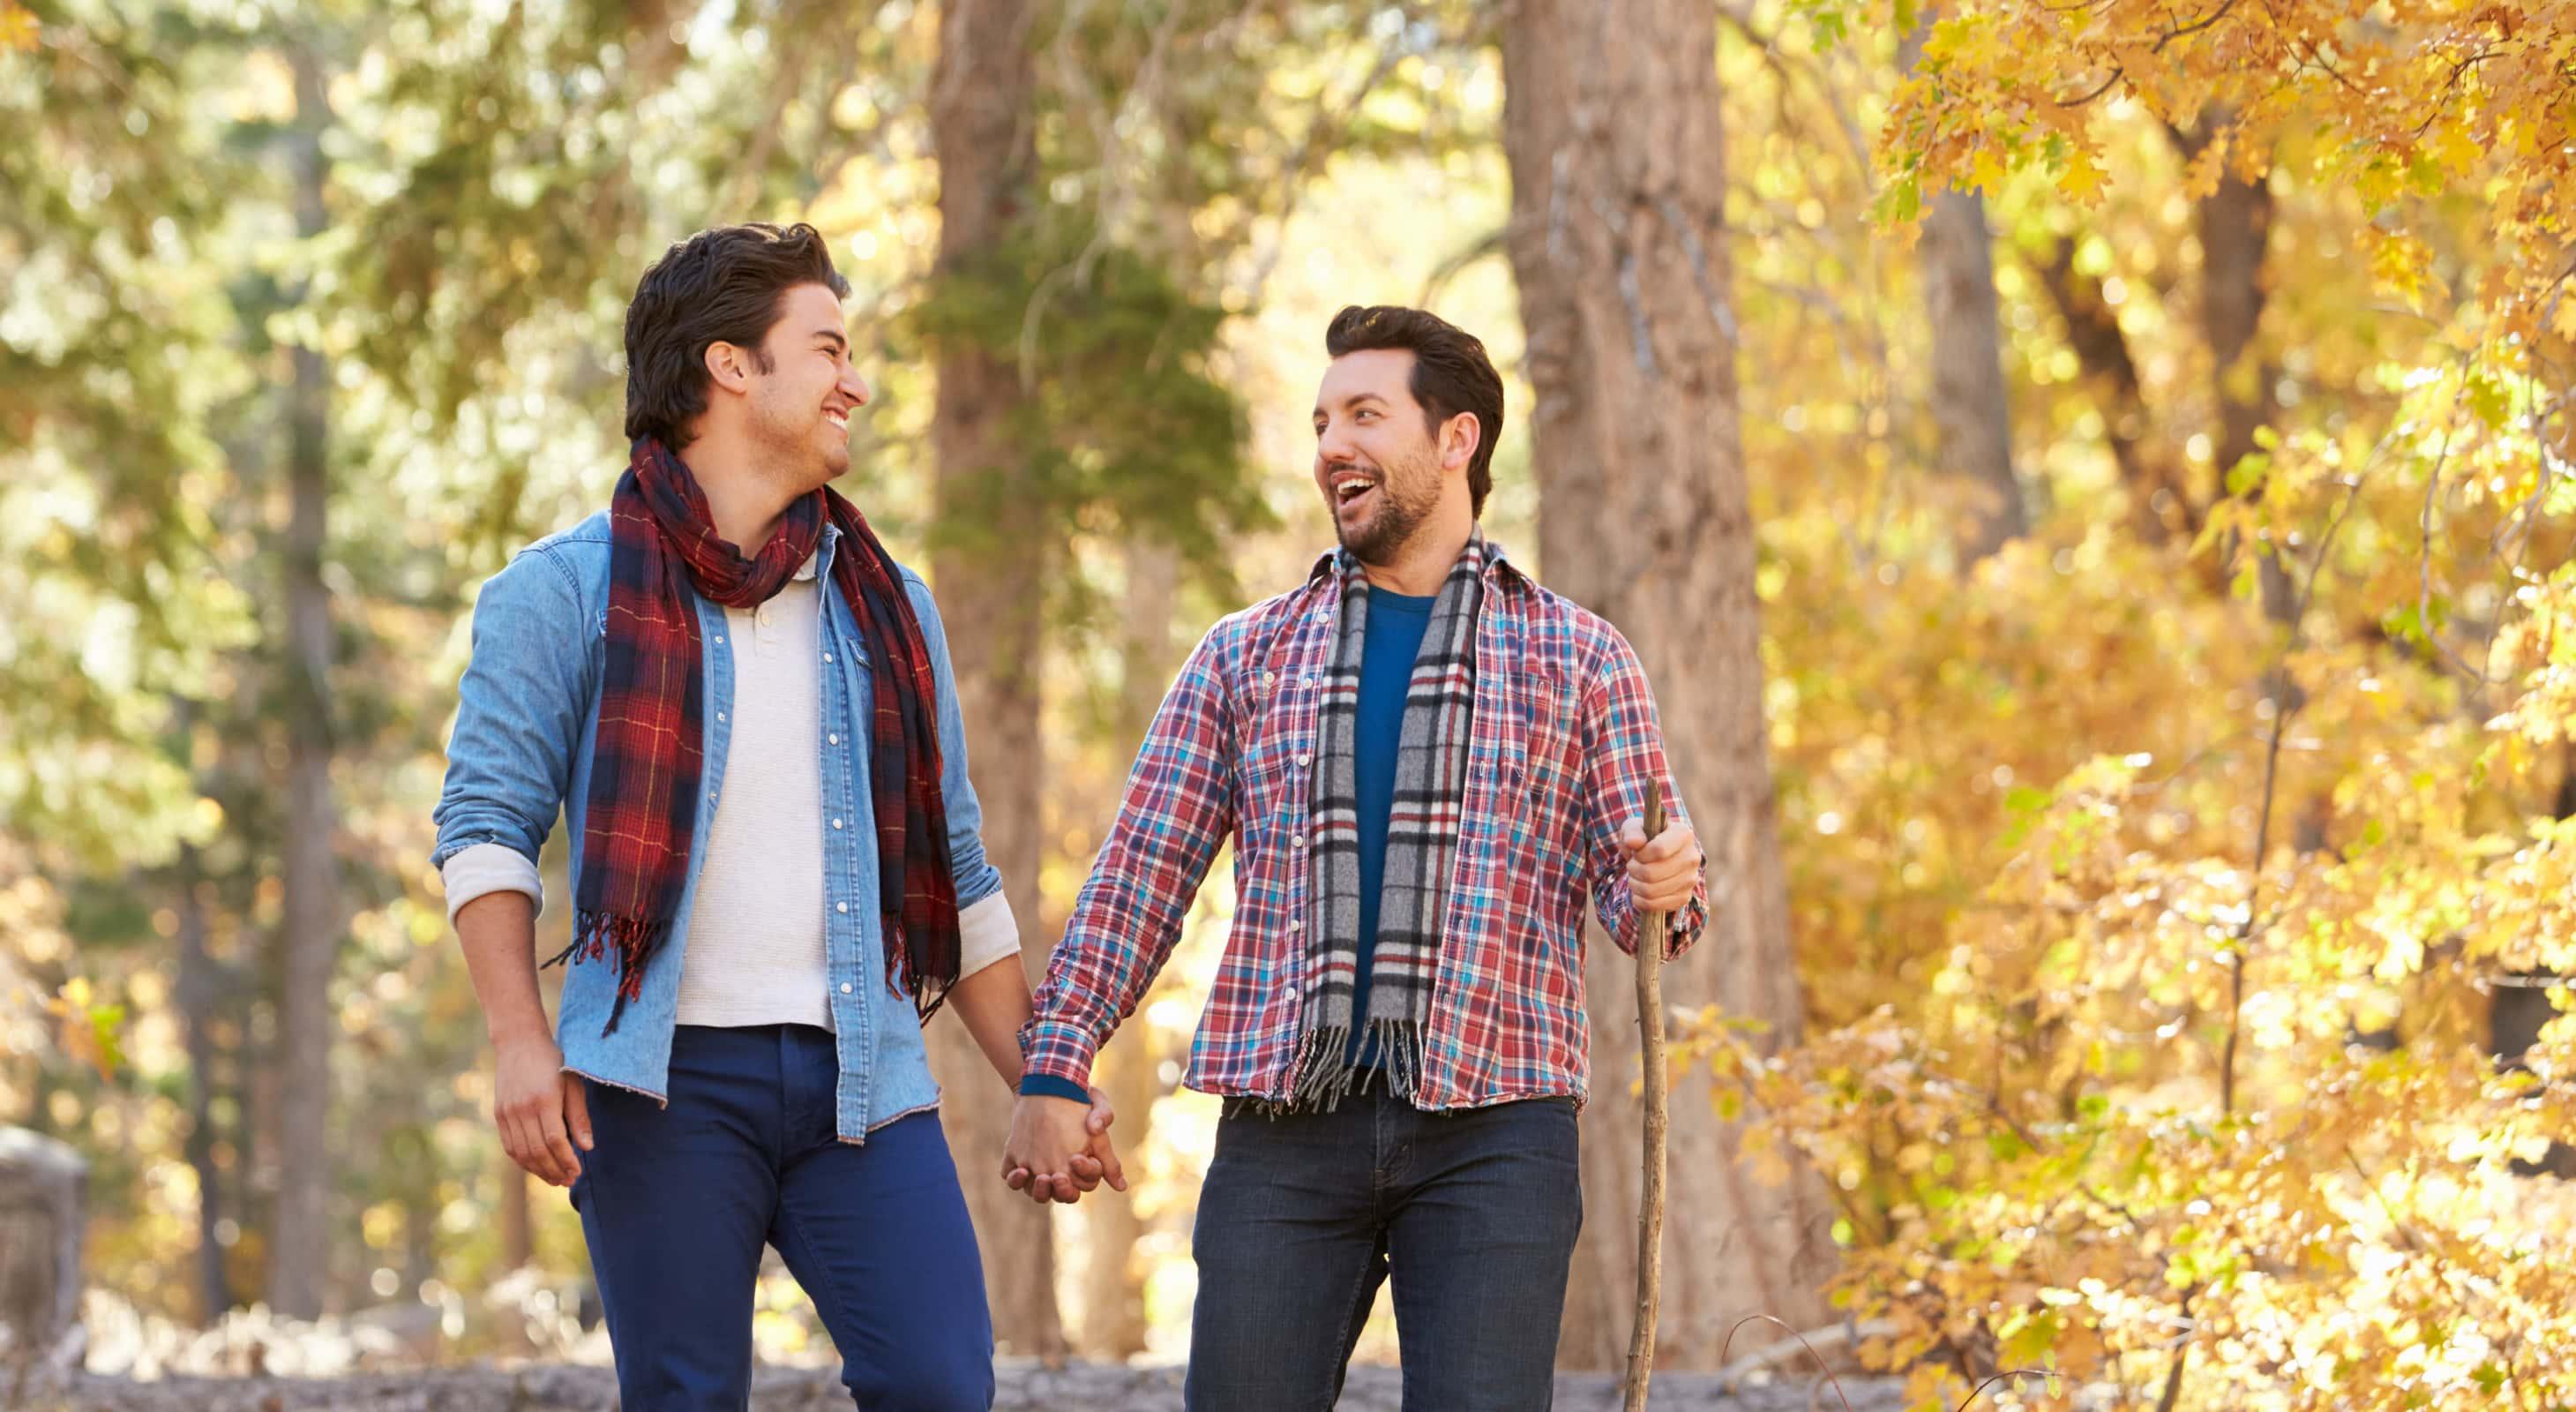 A couple on a romantic fall hike getaway